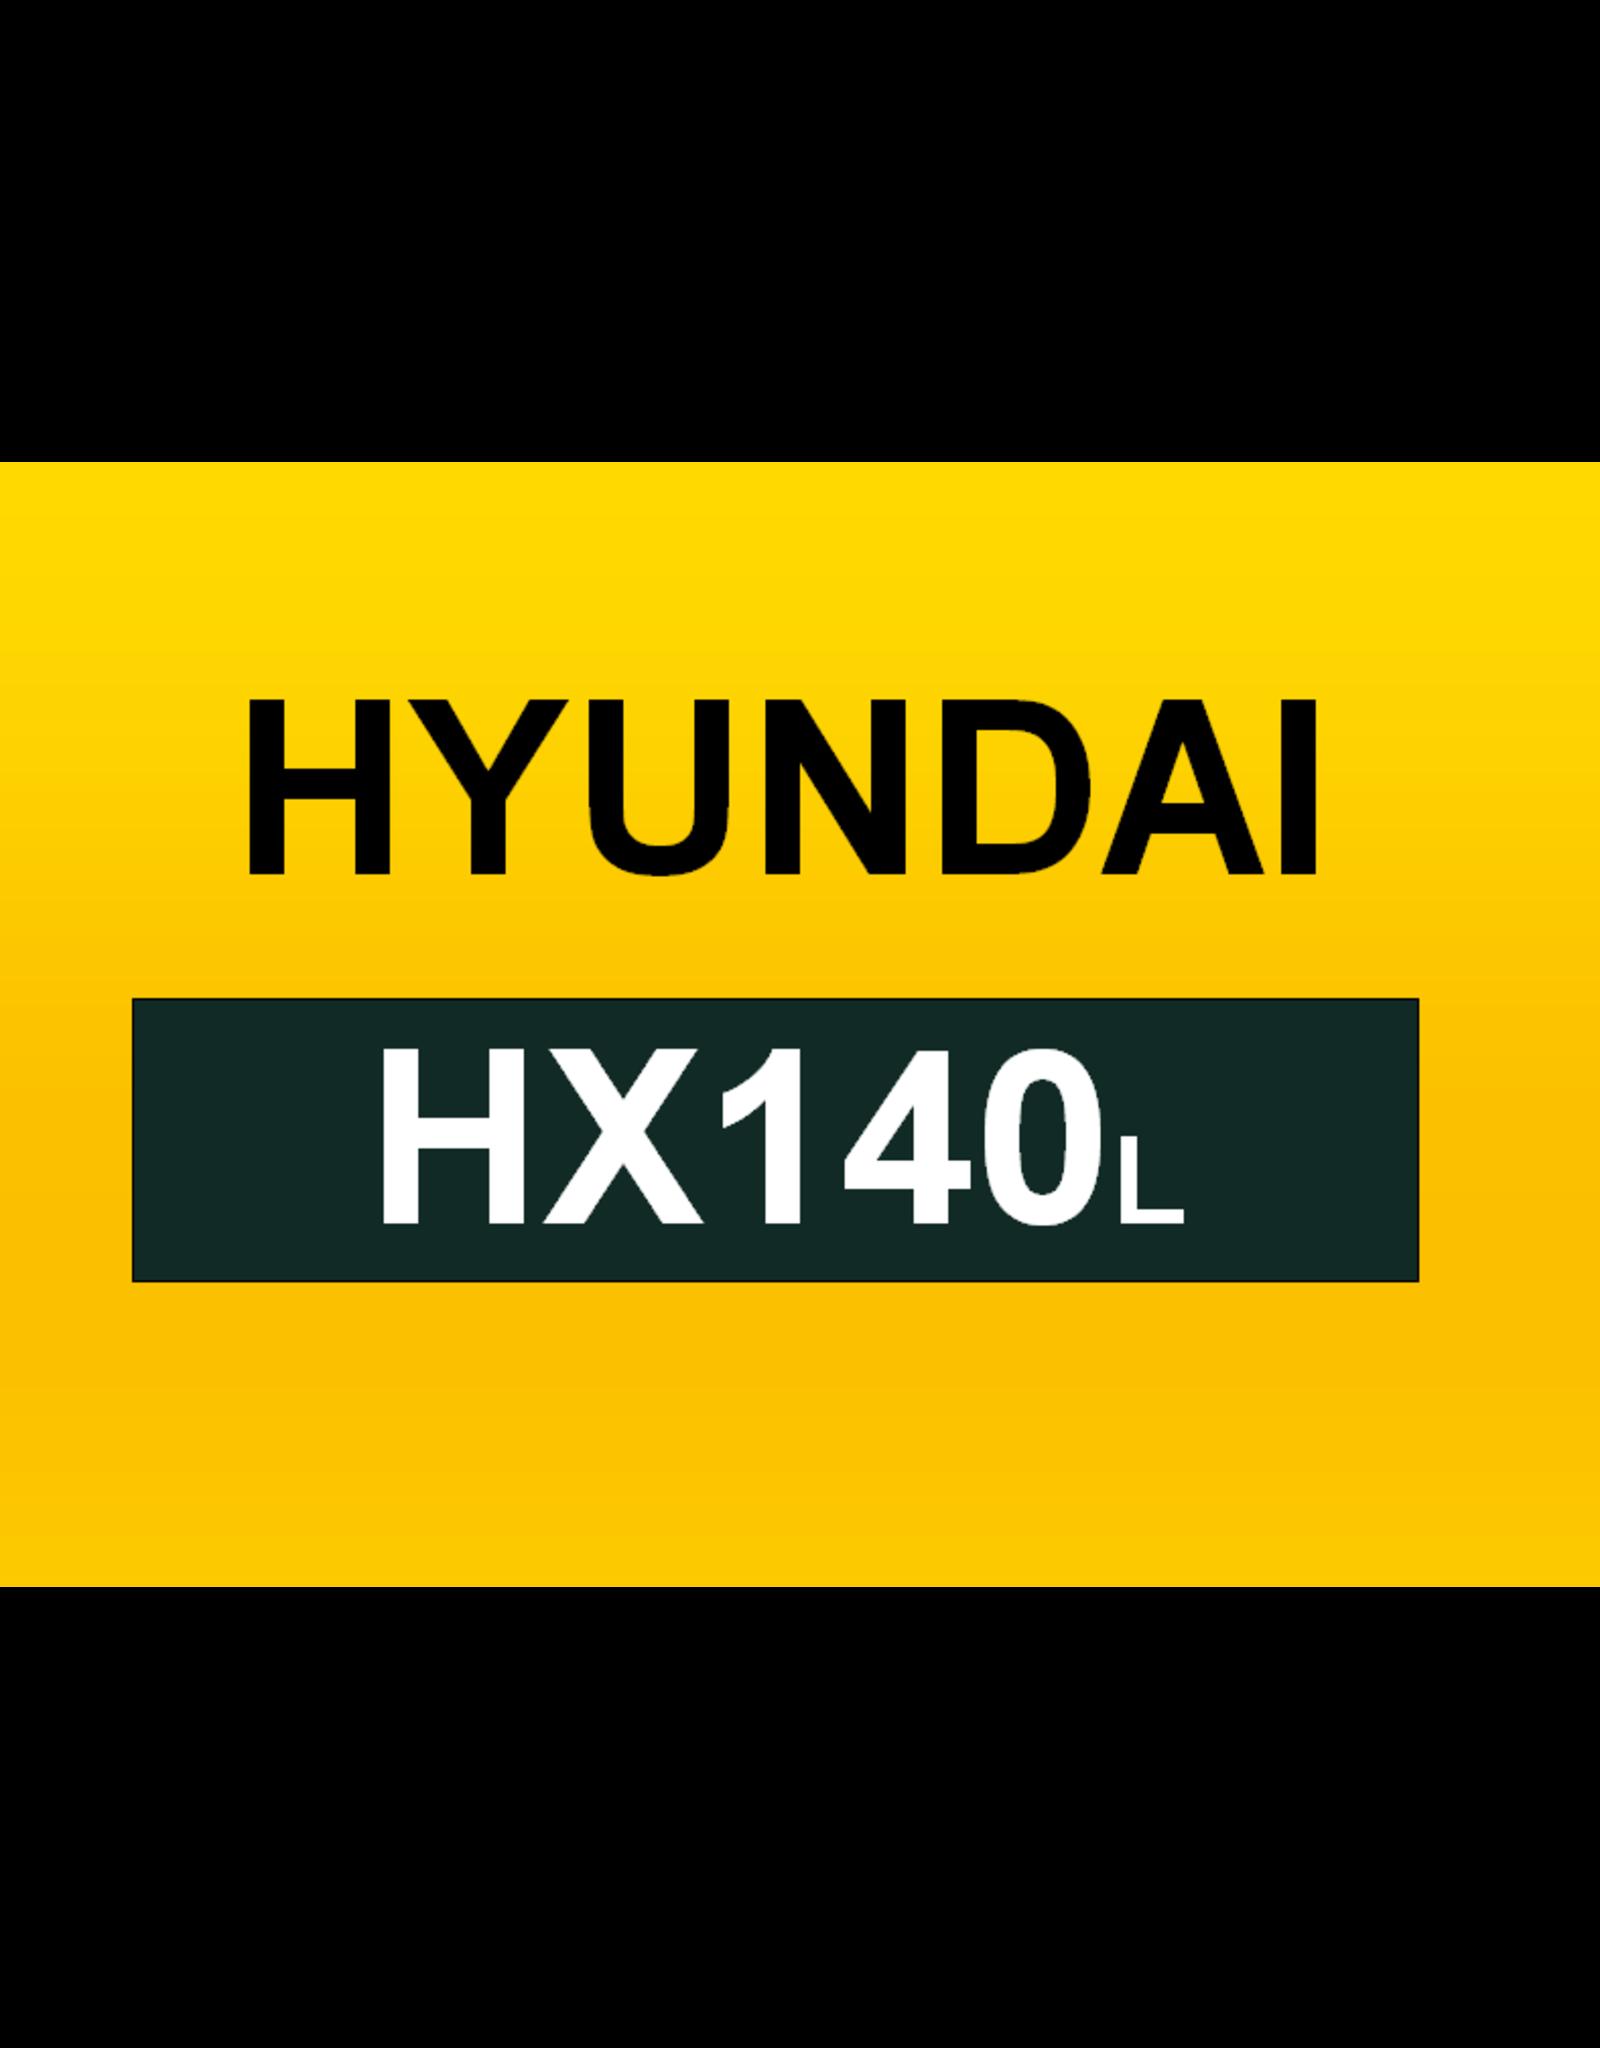 Echle Hartstahl GmbH FOPS for Hyundai HX140L